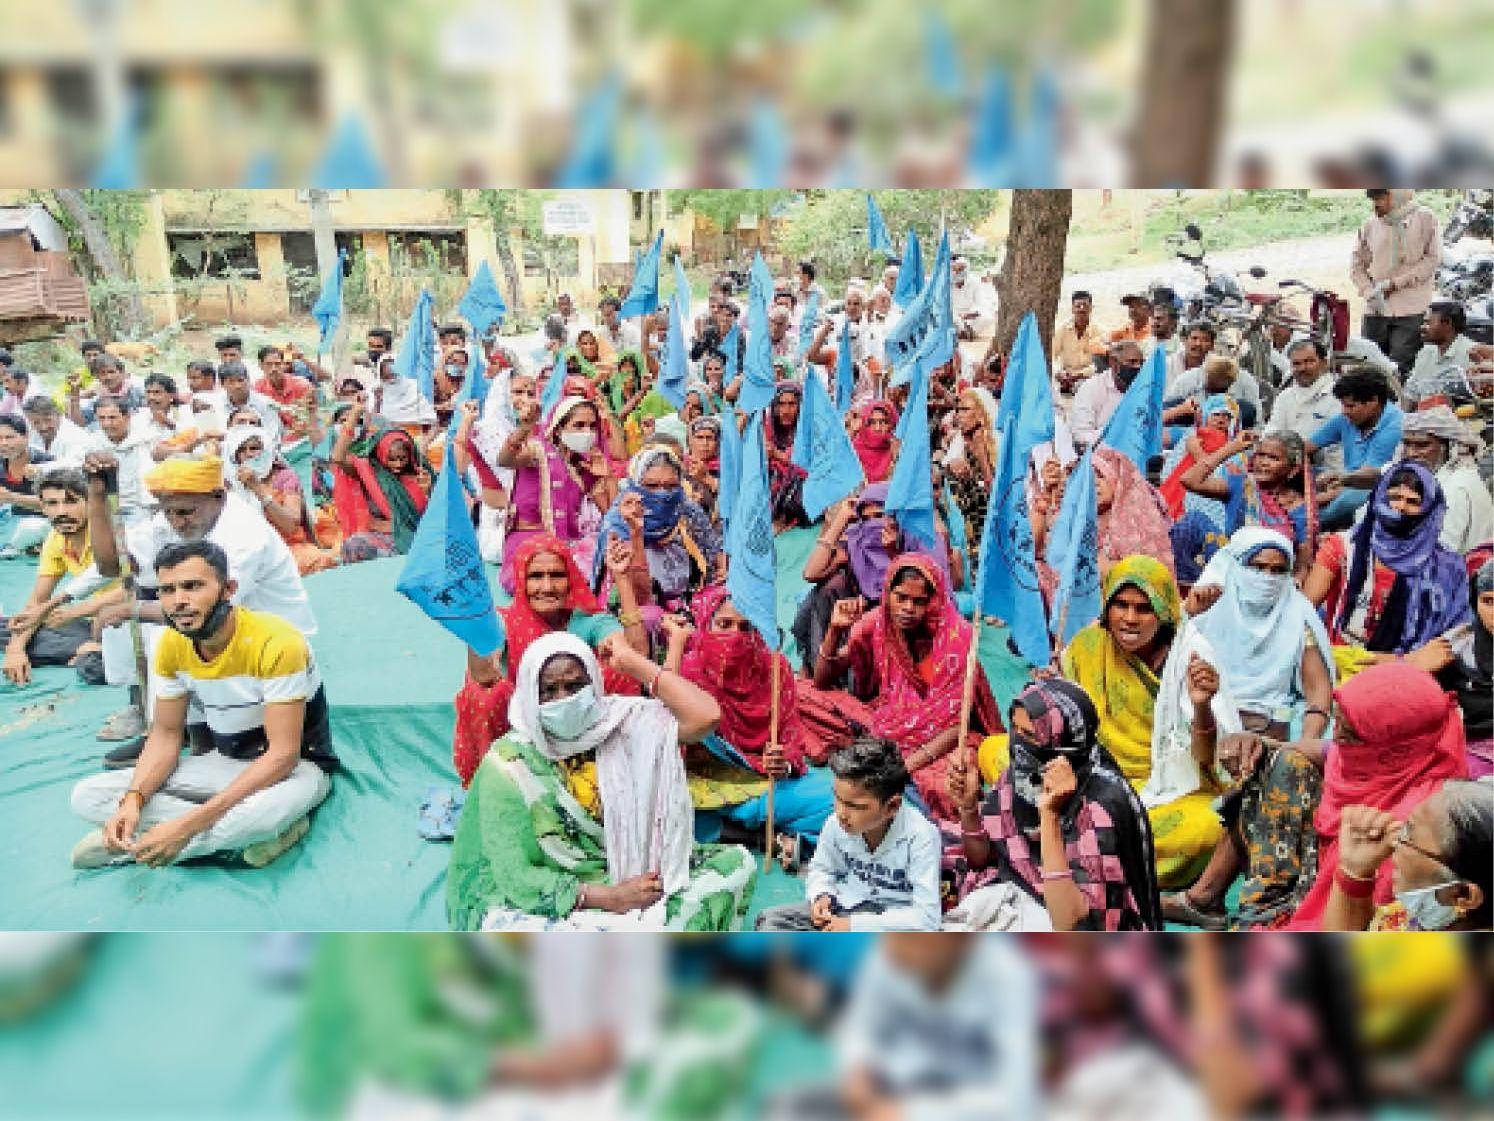 एनवीडीए कार्यालय के बाहर नारे लगाते नबआं कार्यकर्ता व डूब प्रभावित। - Dainik Bhaskar